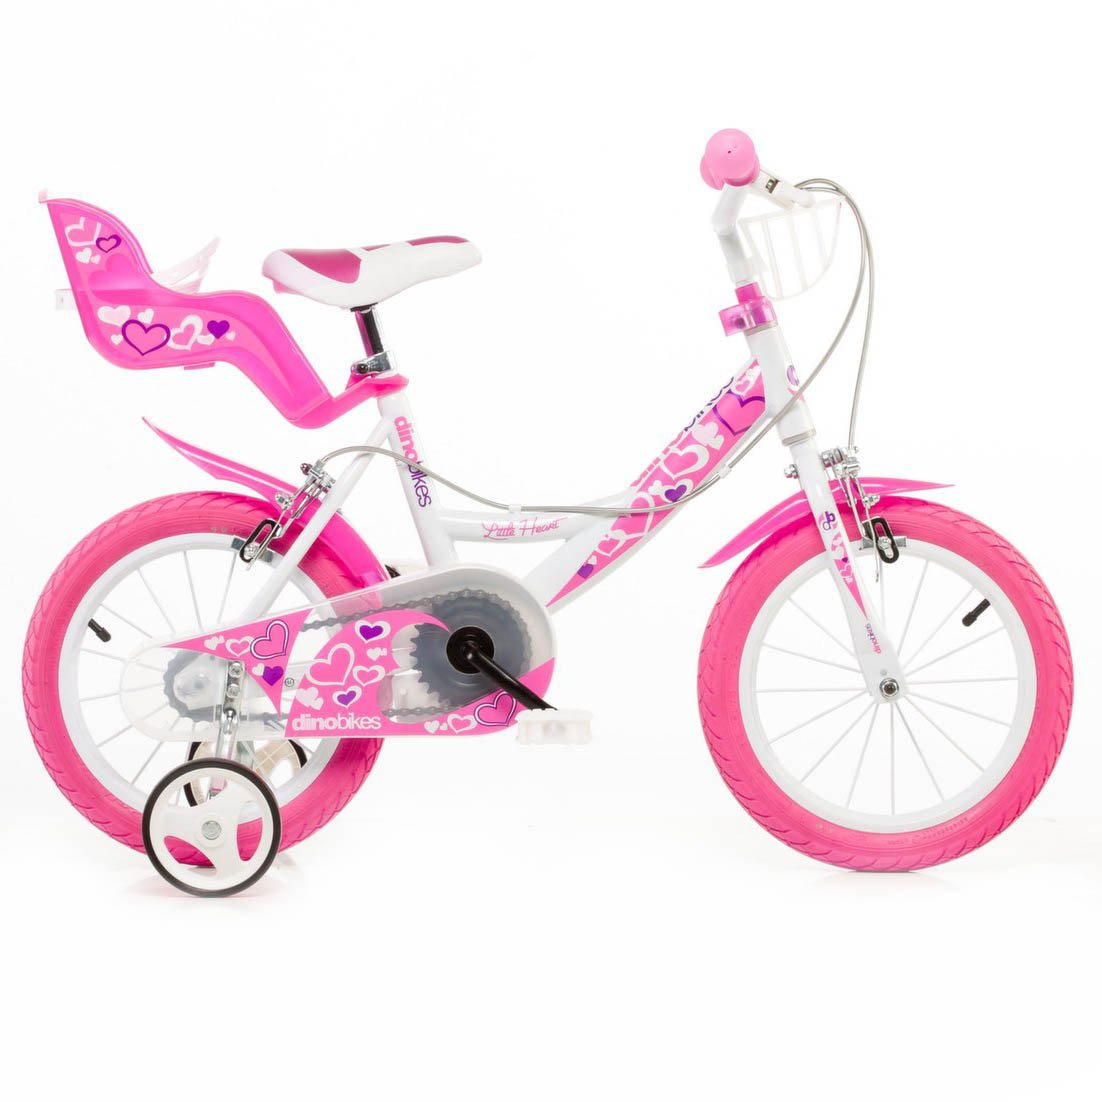 "Bērnu divritenis velosipēds Dino bikes Little Heart 16"" 164RN-05LH"